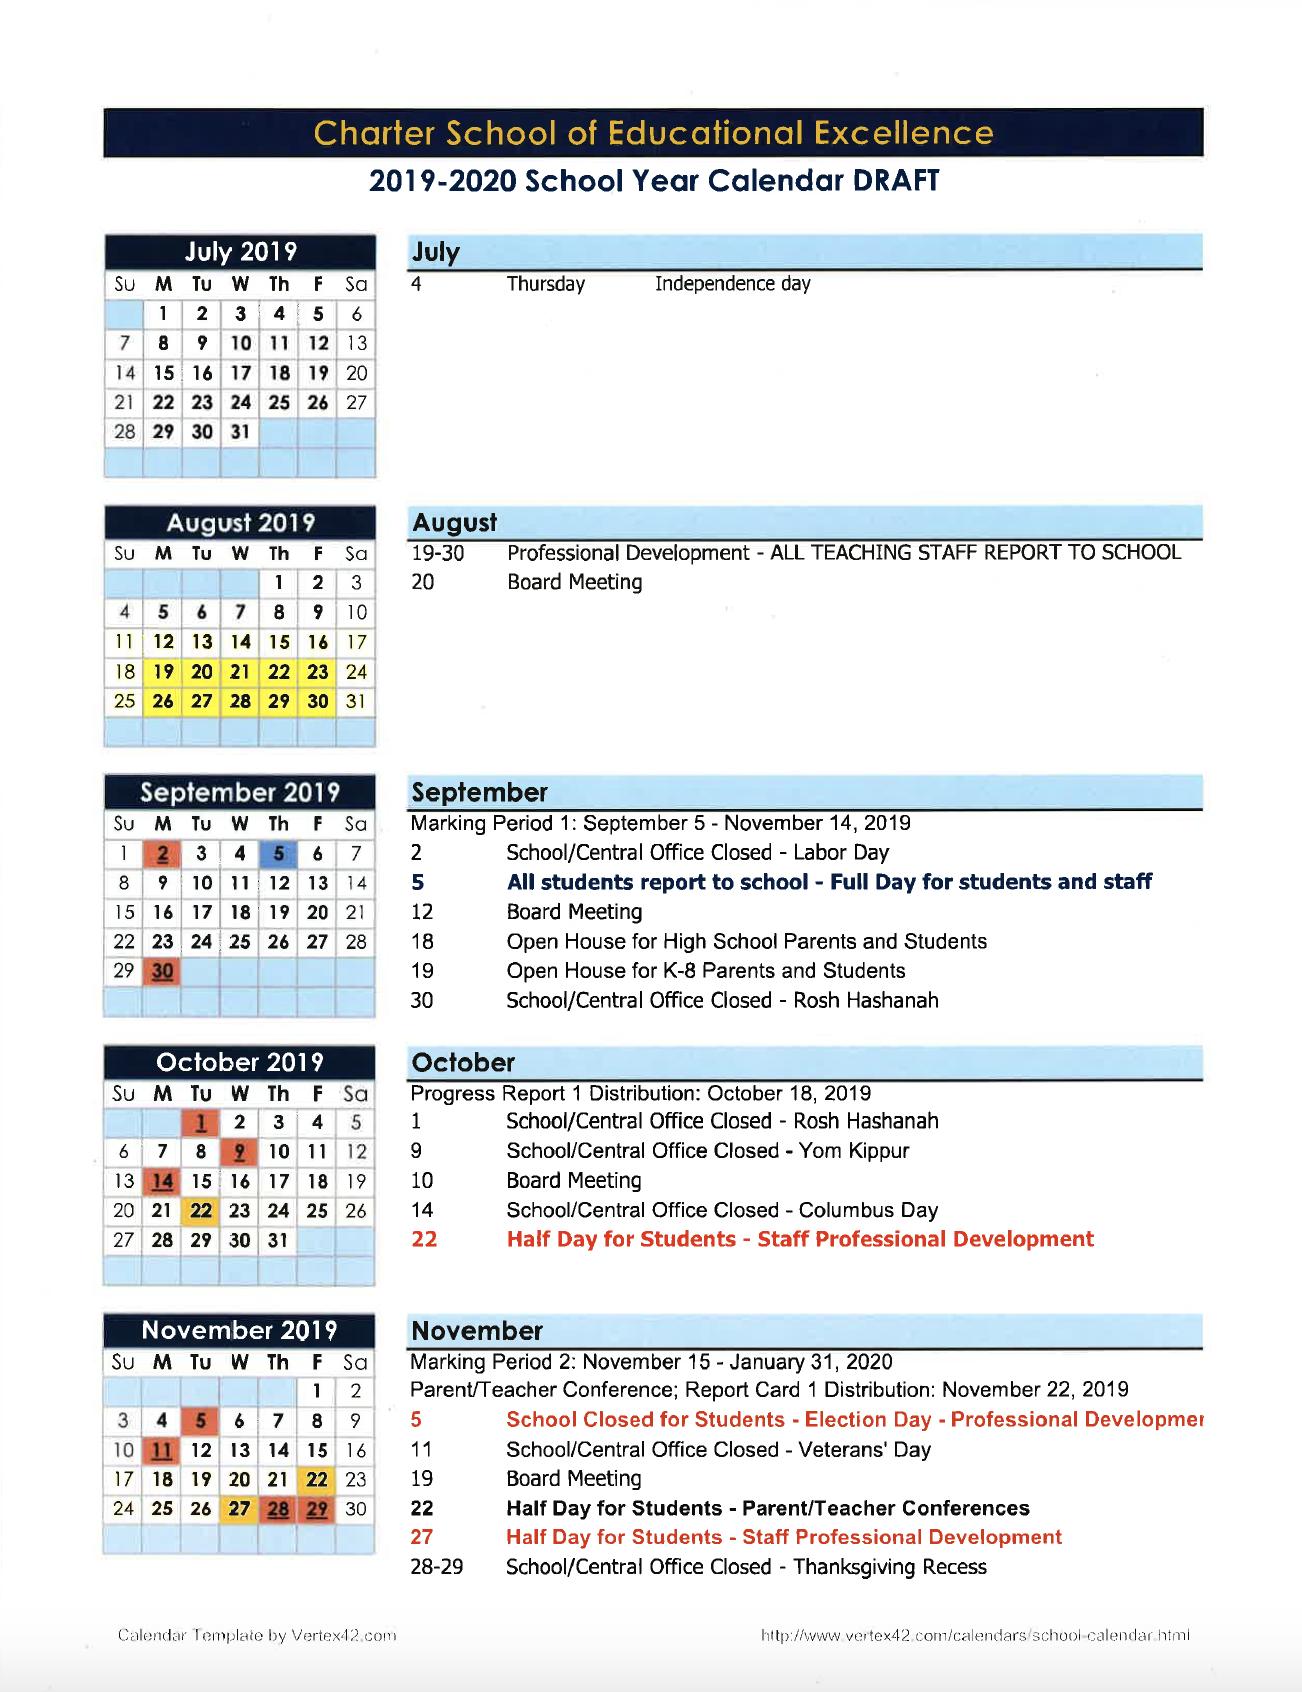 Academic Calendar | The City College Of New York Regarding Regarding Turningstone Bingo Schedule Feb 2020